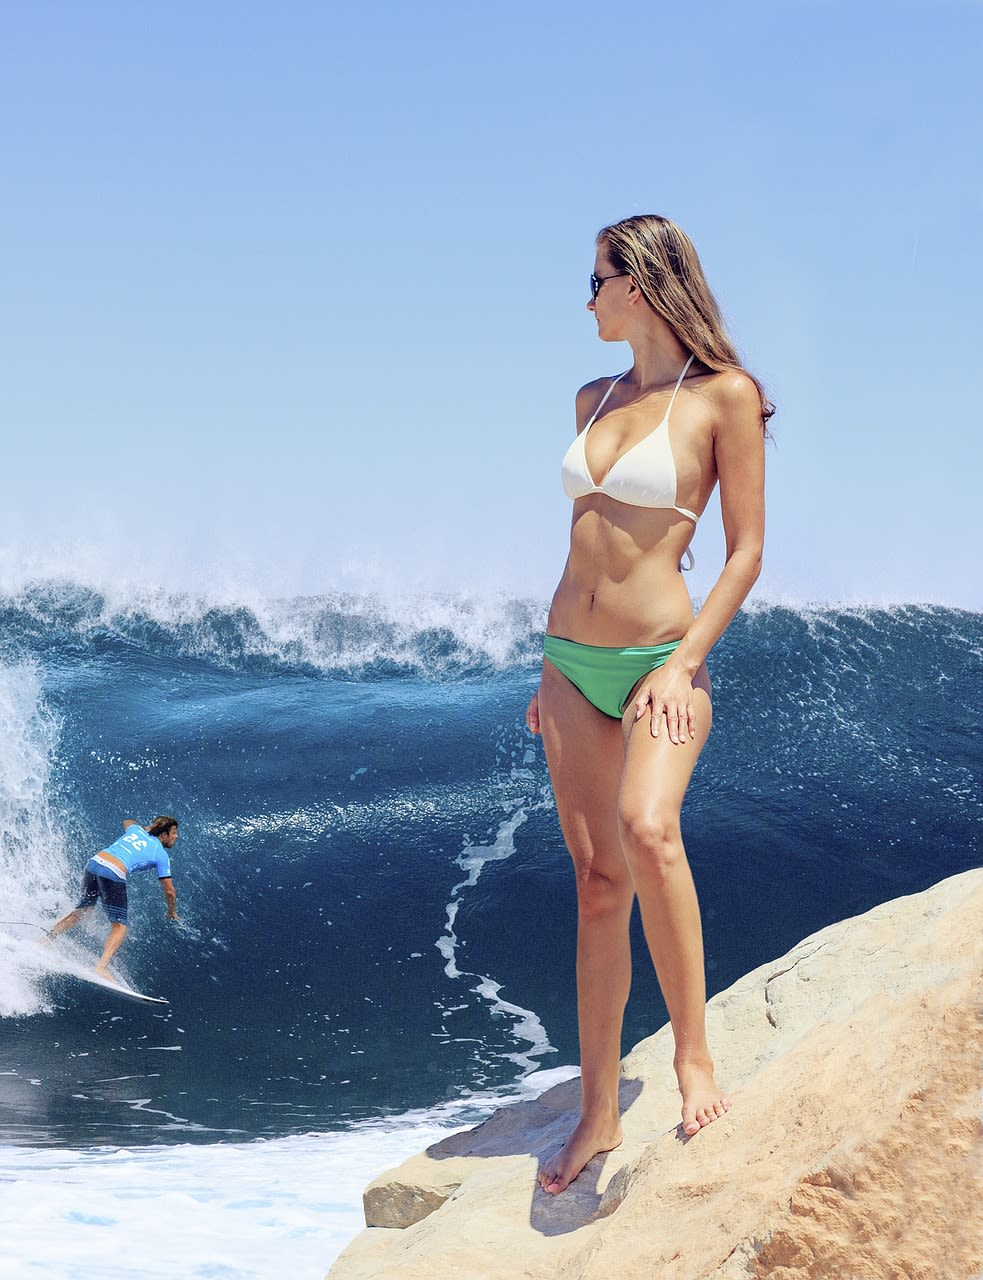 Surfer in huge wave with bikini girl